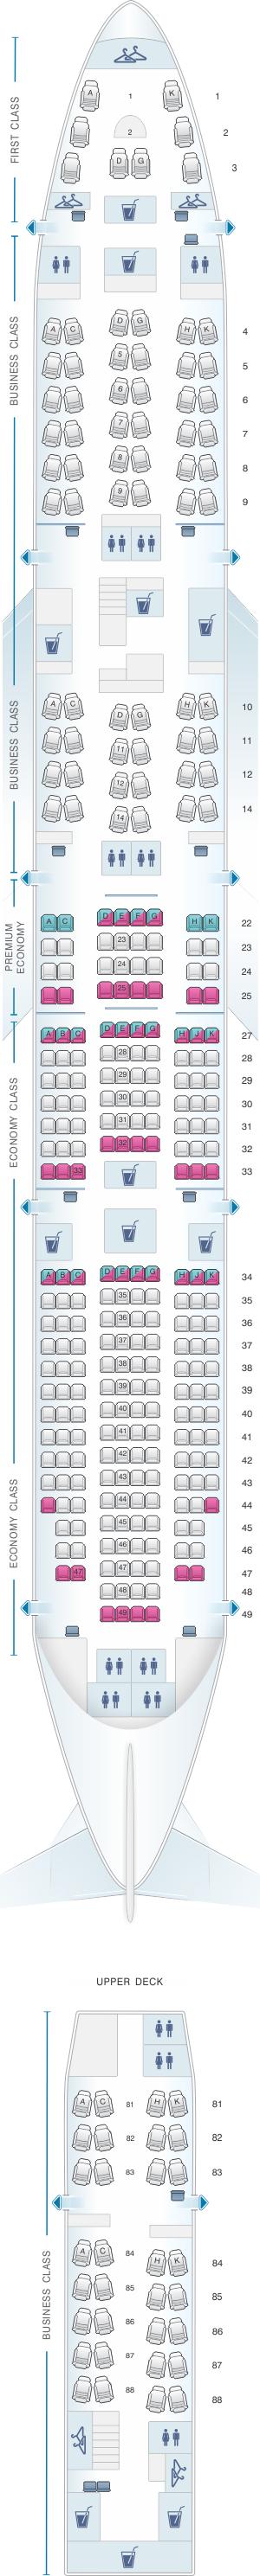 Seat map for Lufthansa Boeing B747-8 340pax